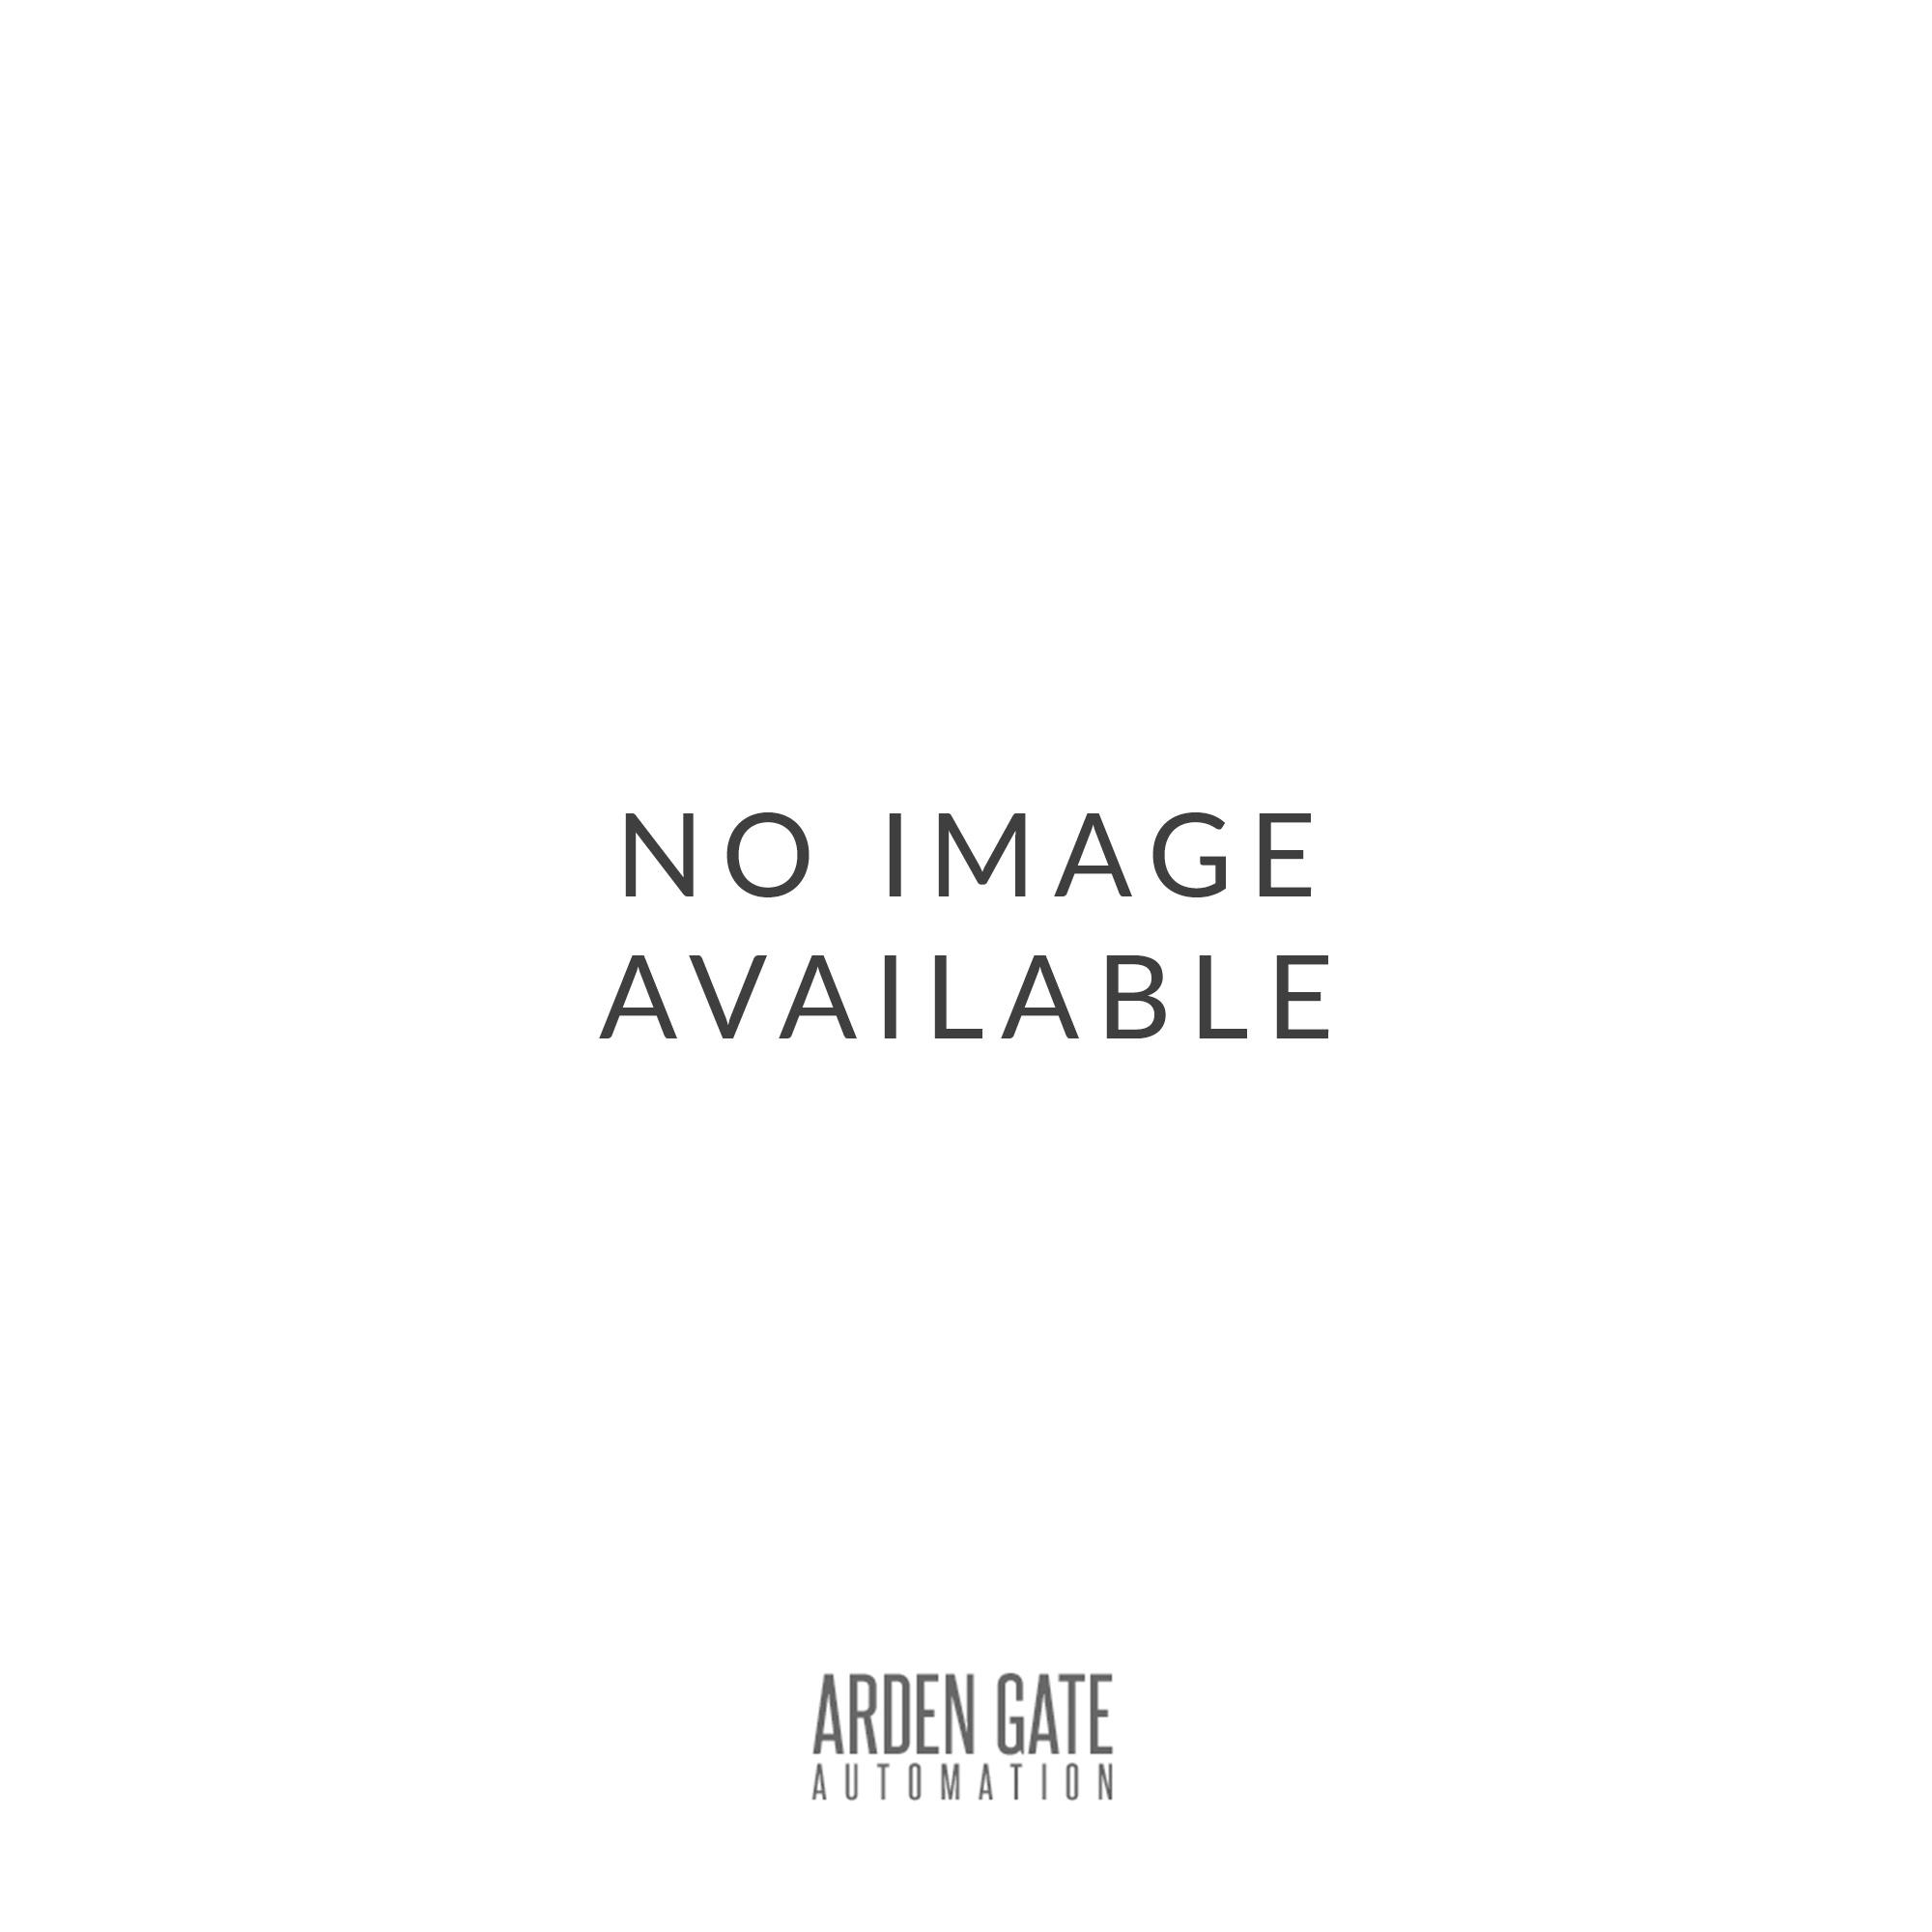 CAME ISO 7810 - 7813 format transponder card x 5